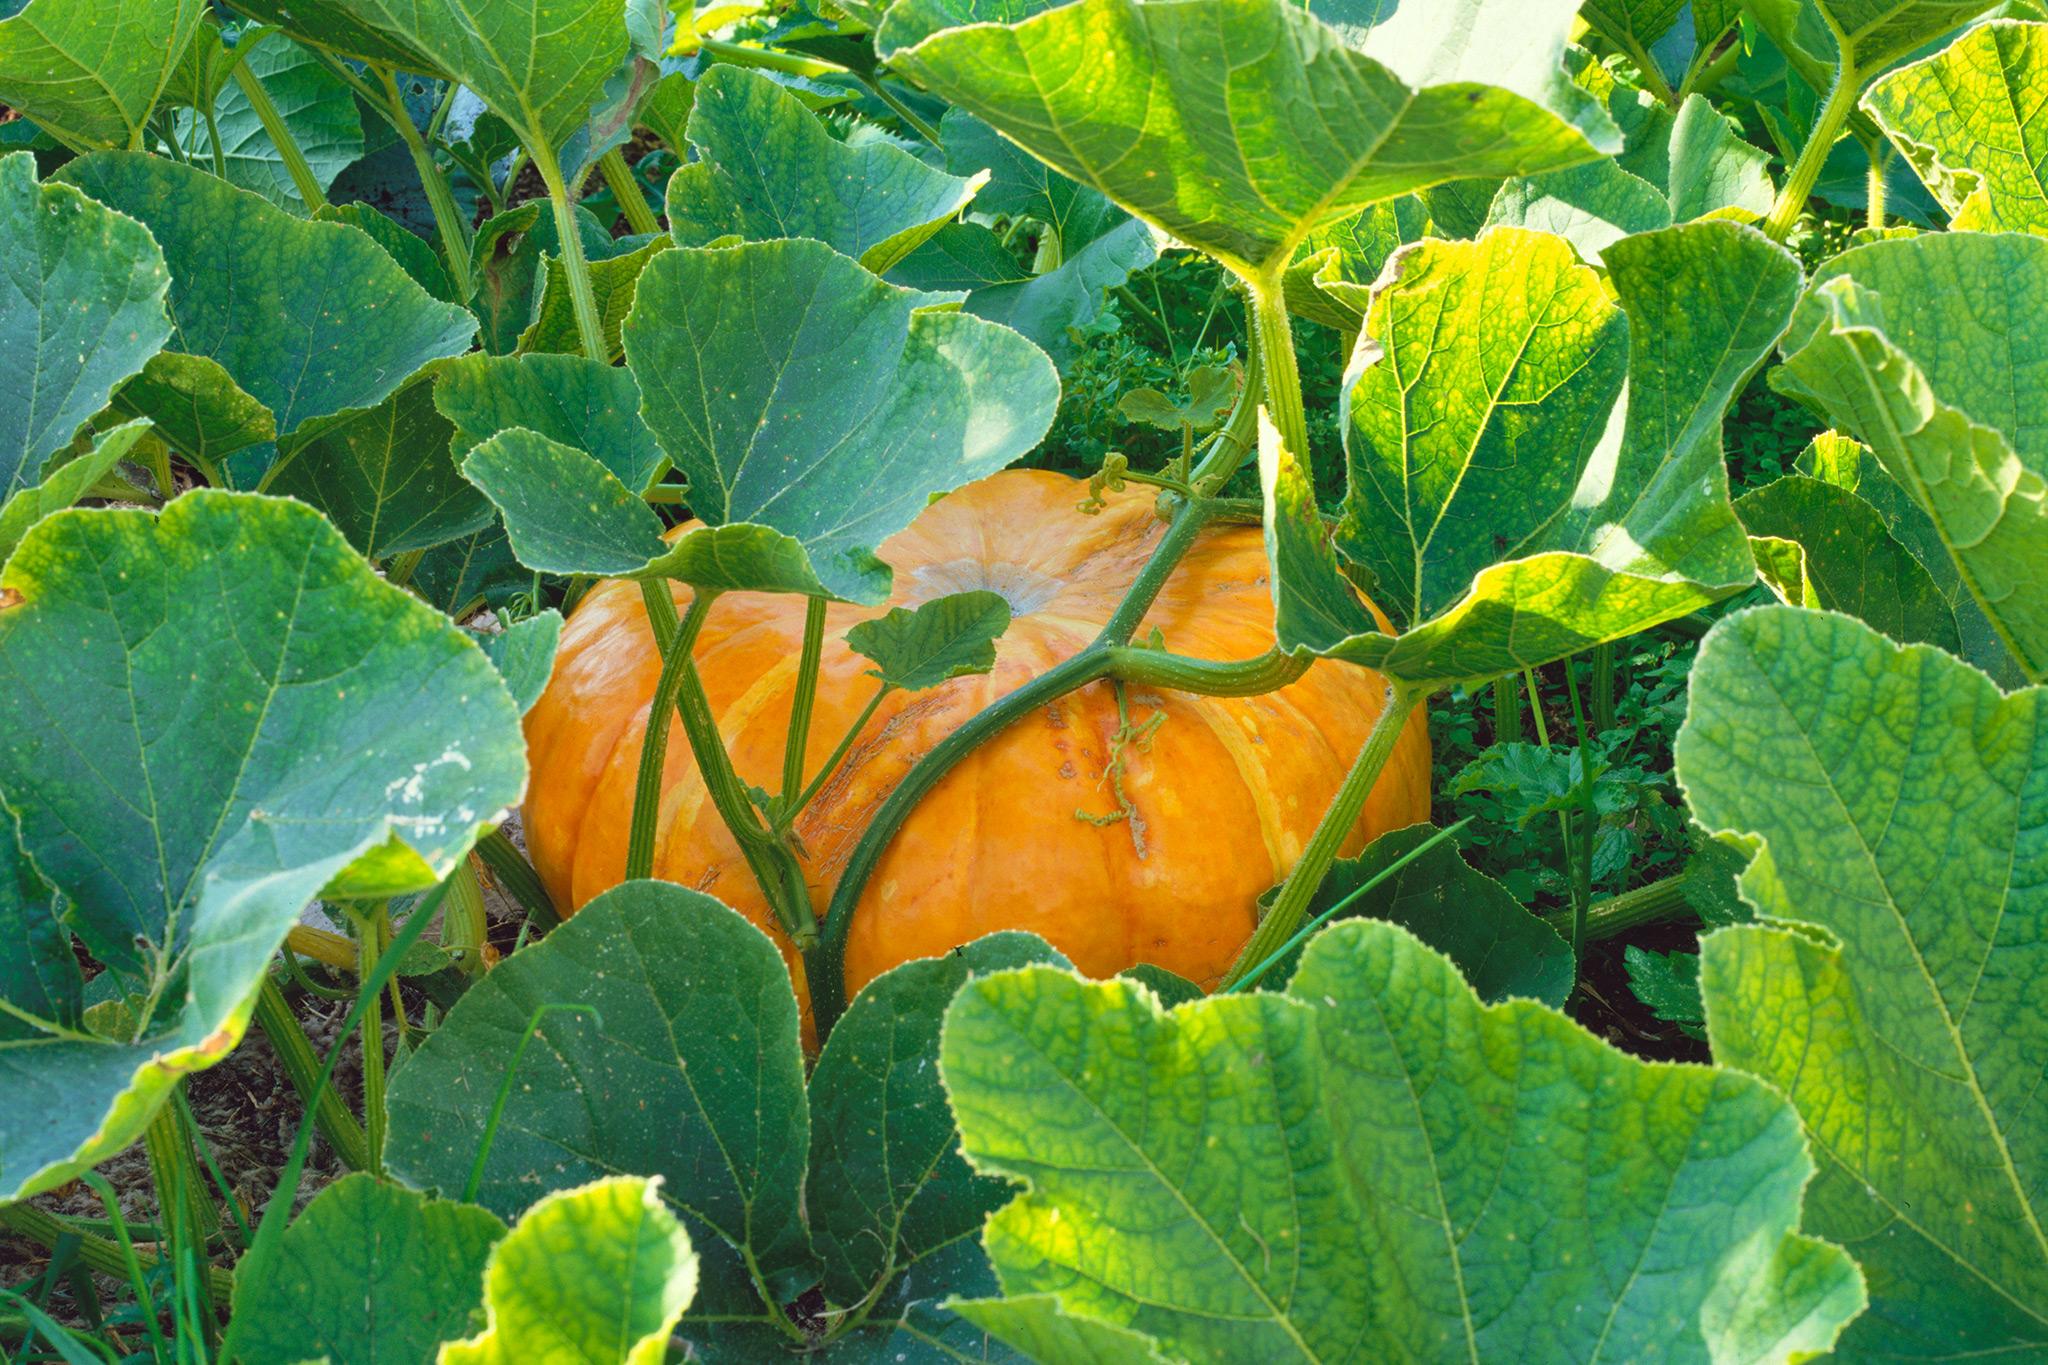 pumpkin-ready-for-harvest-2